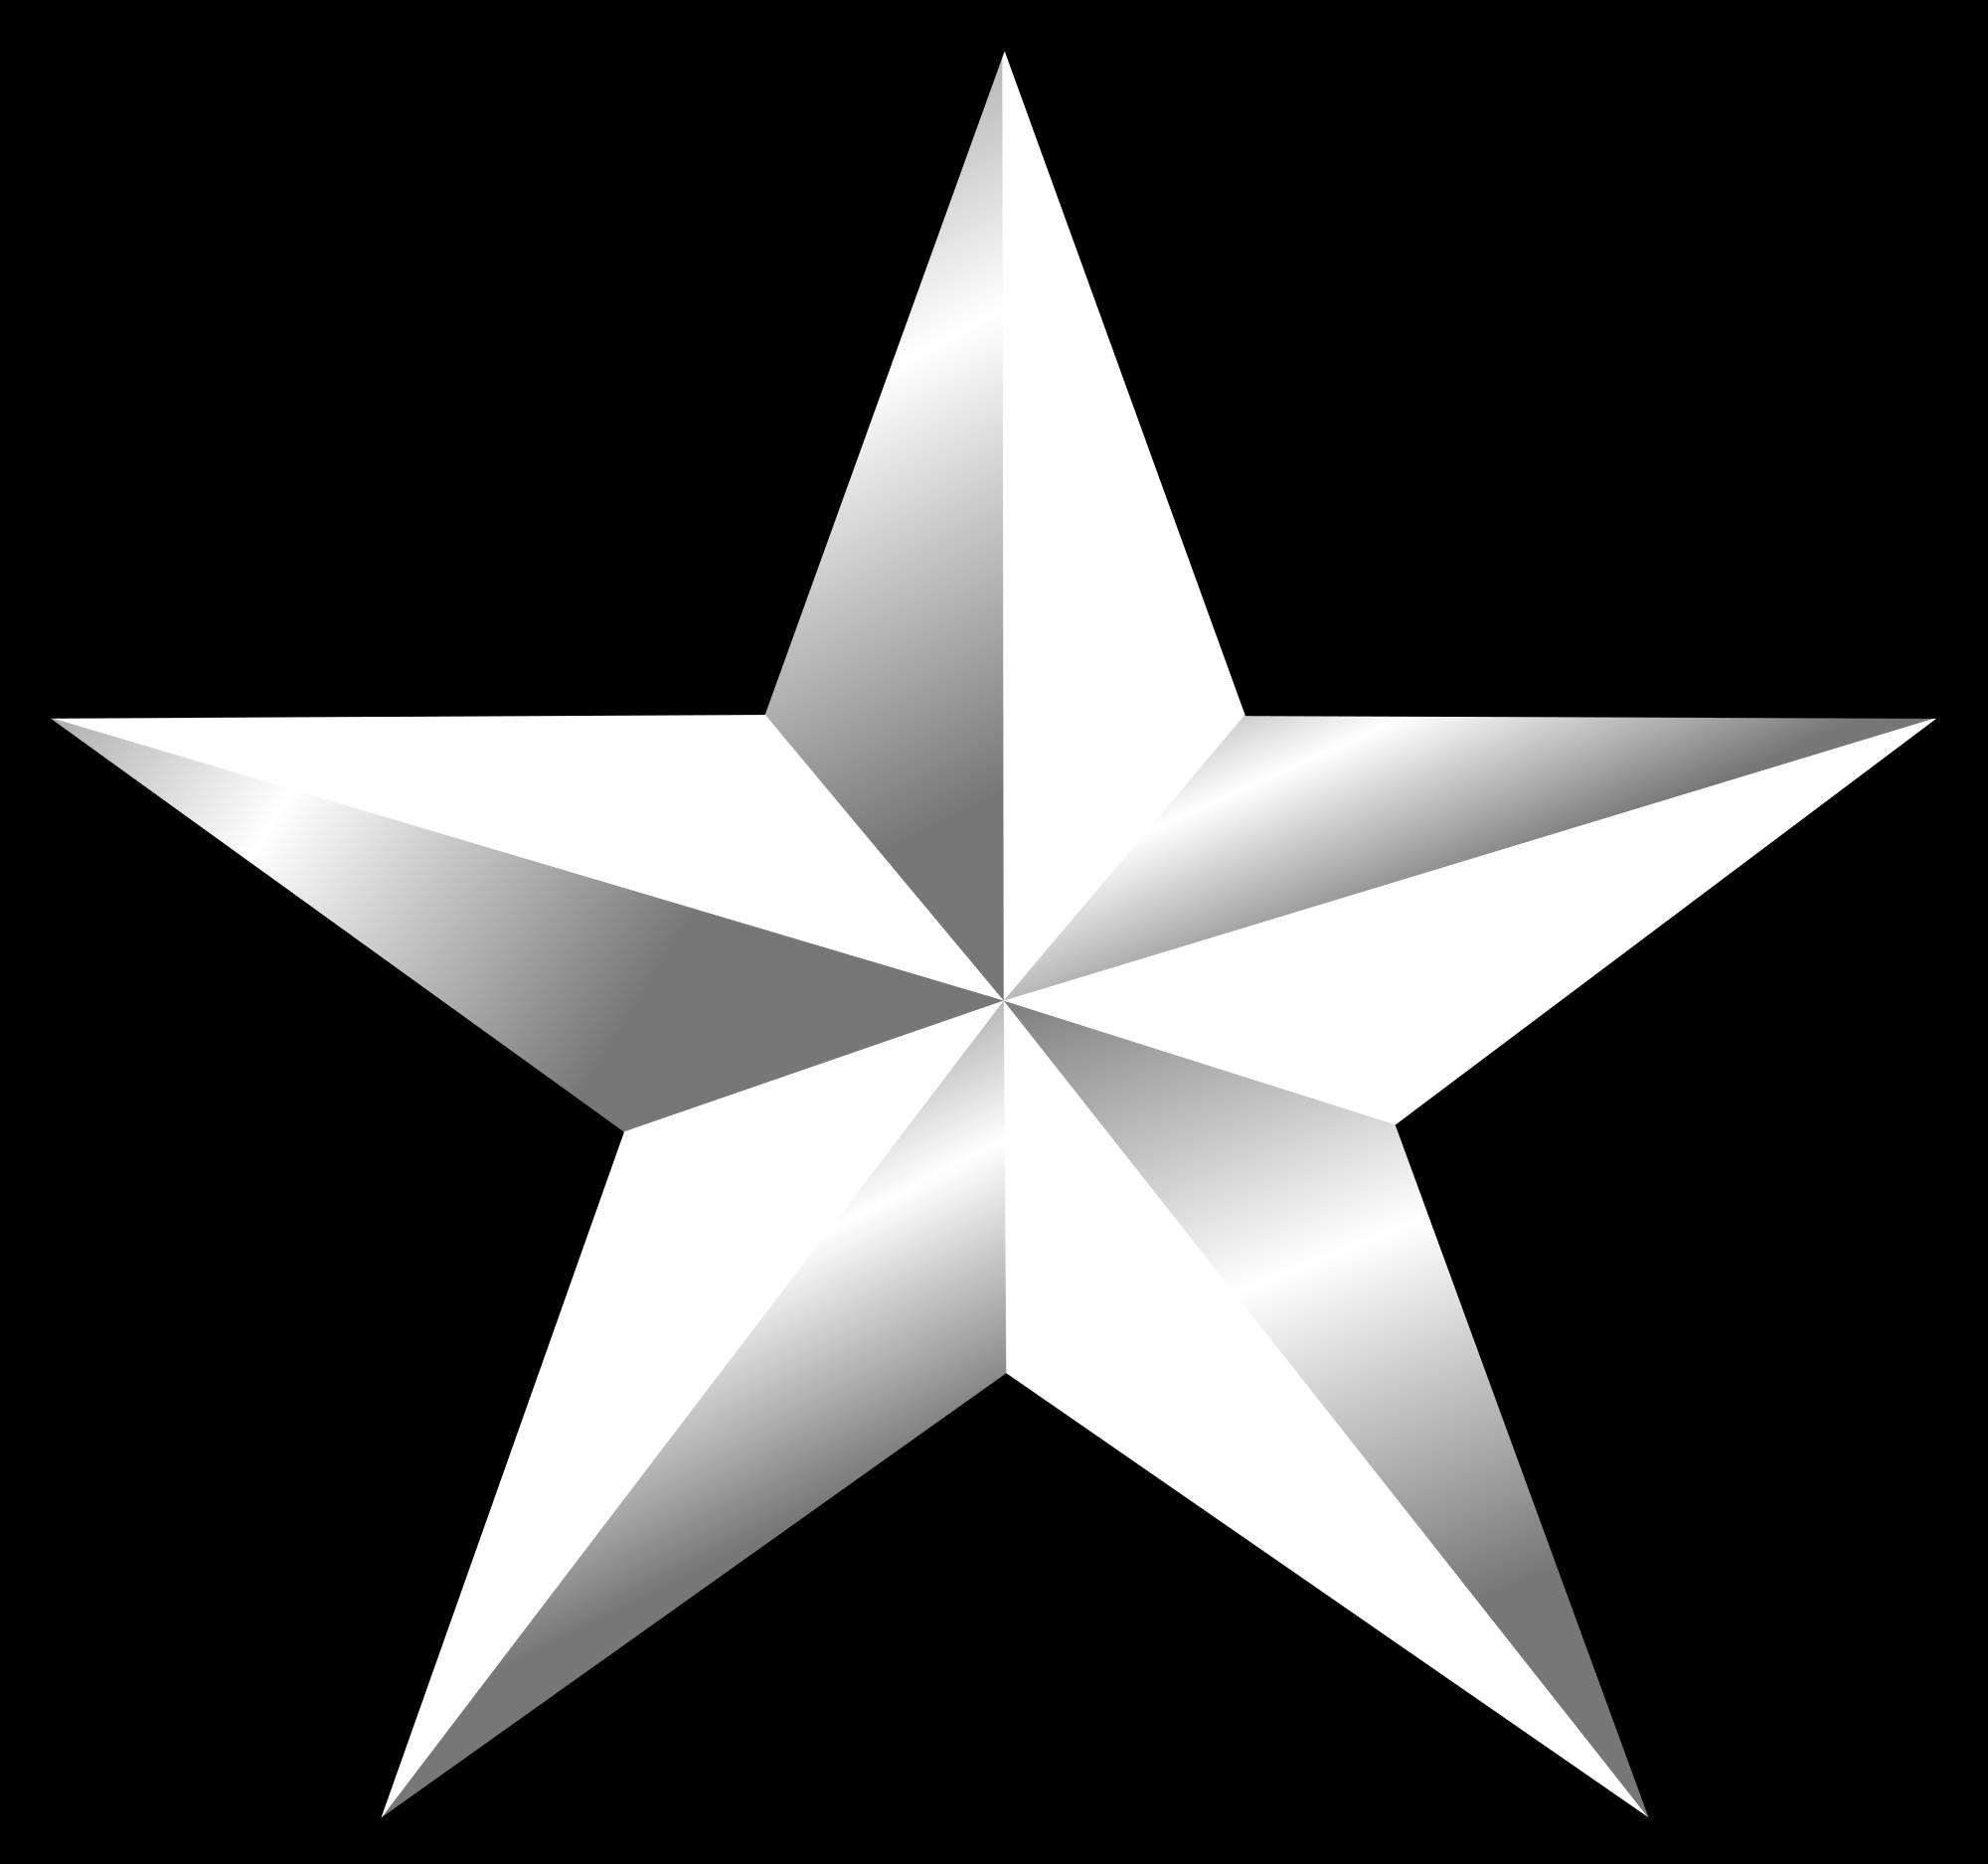 Ninjago star clipart clip transparent stock Star - Coloring Pages Zone clip transparent stock